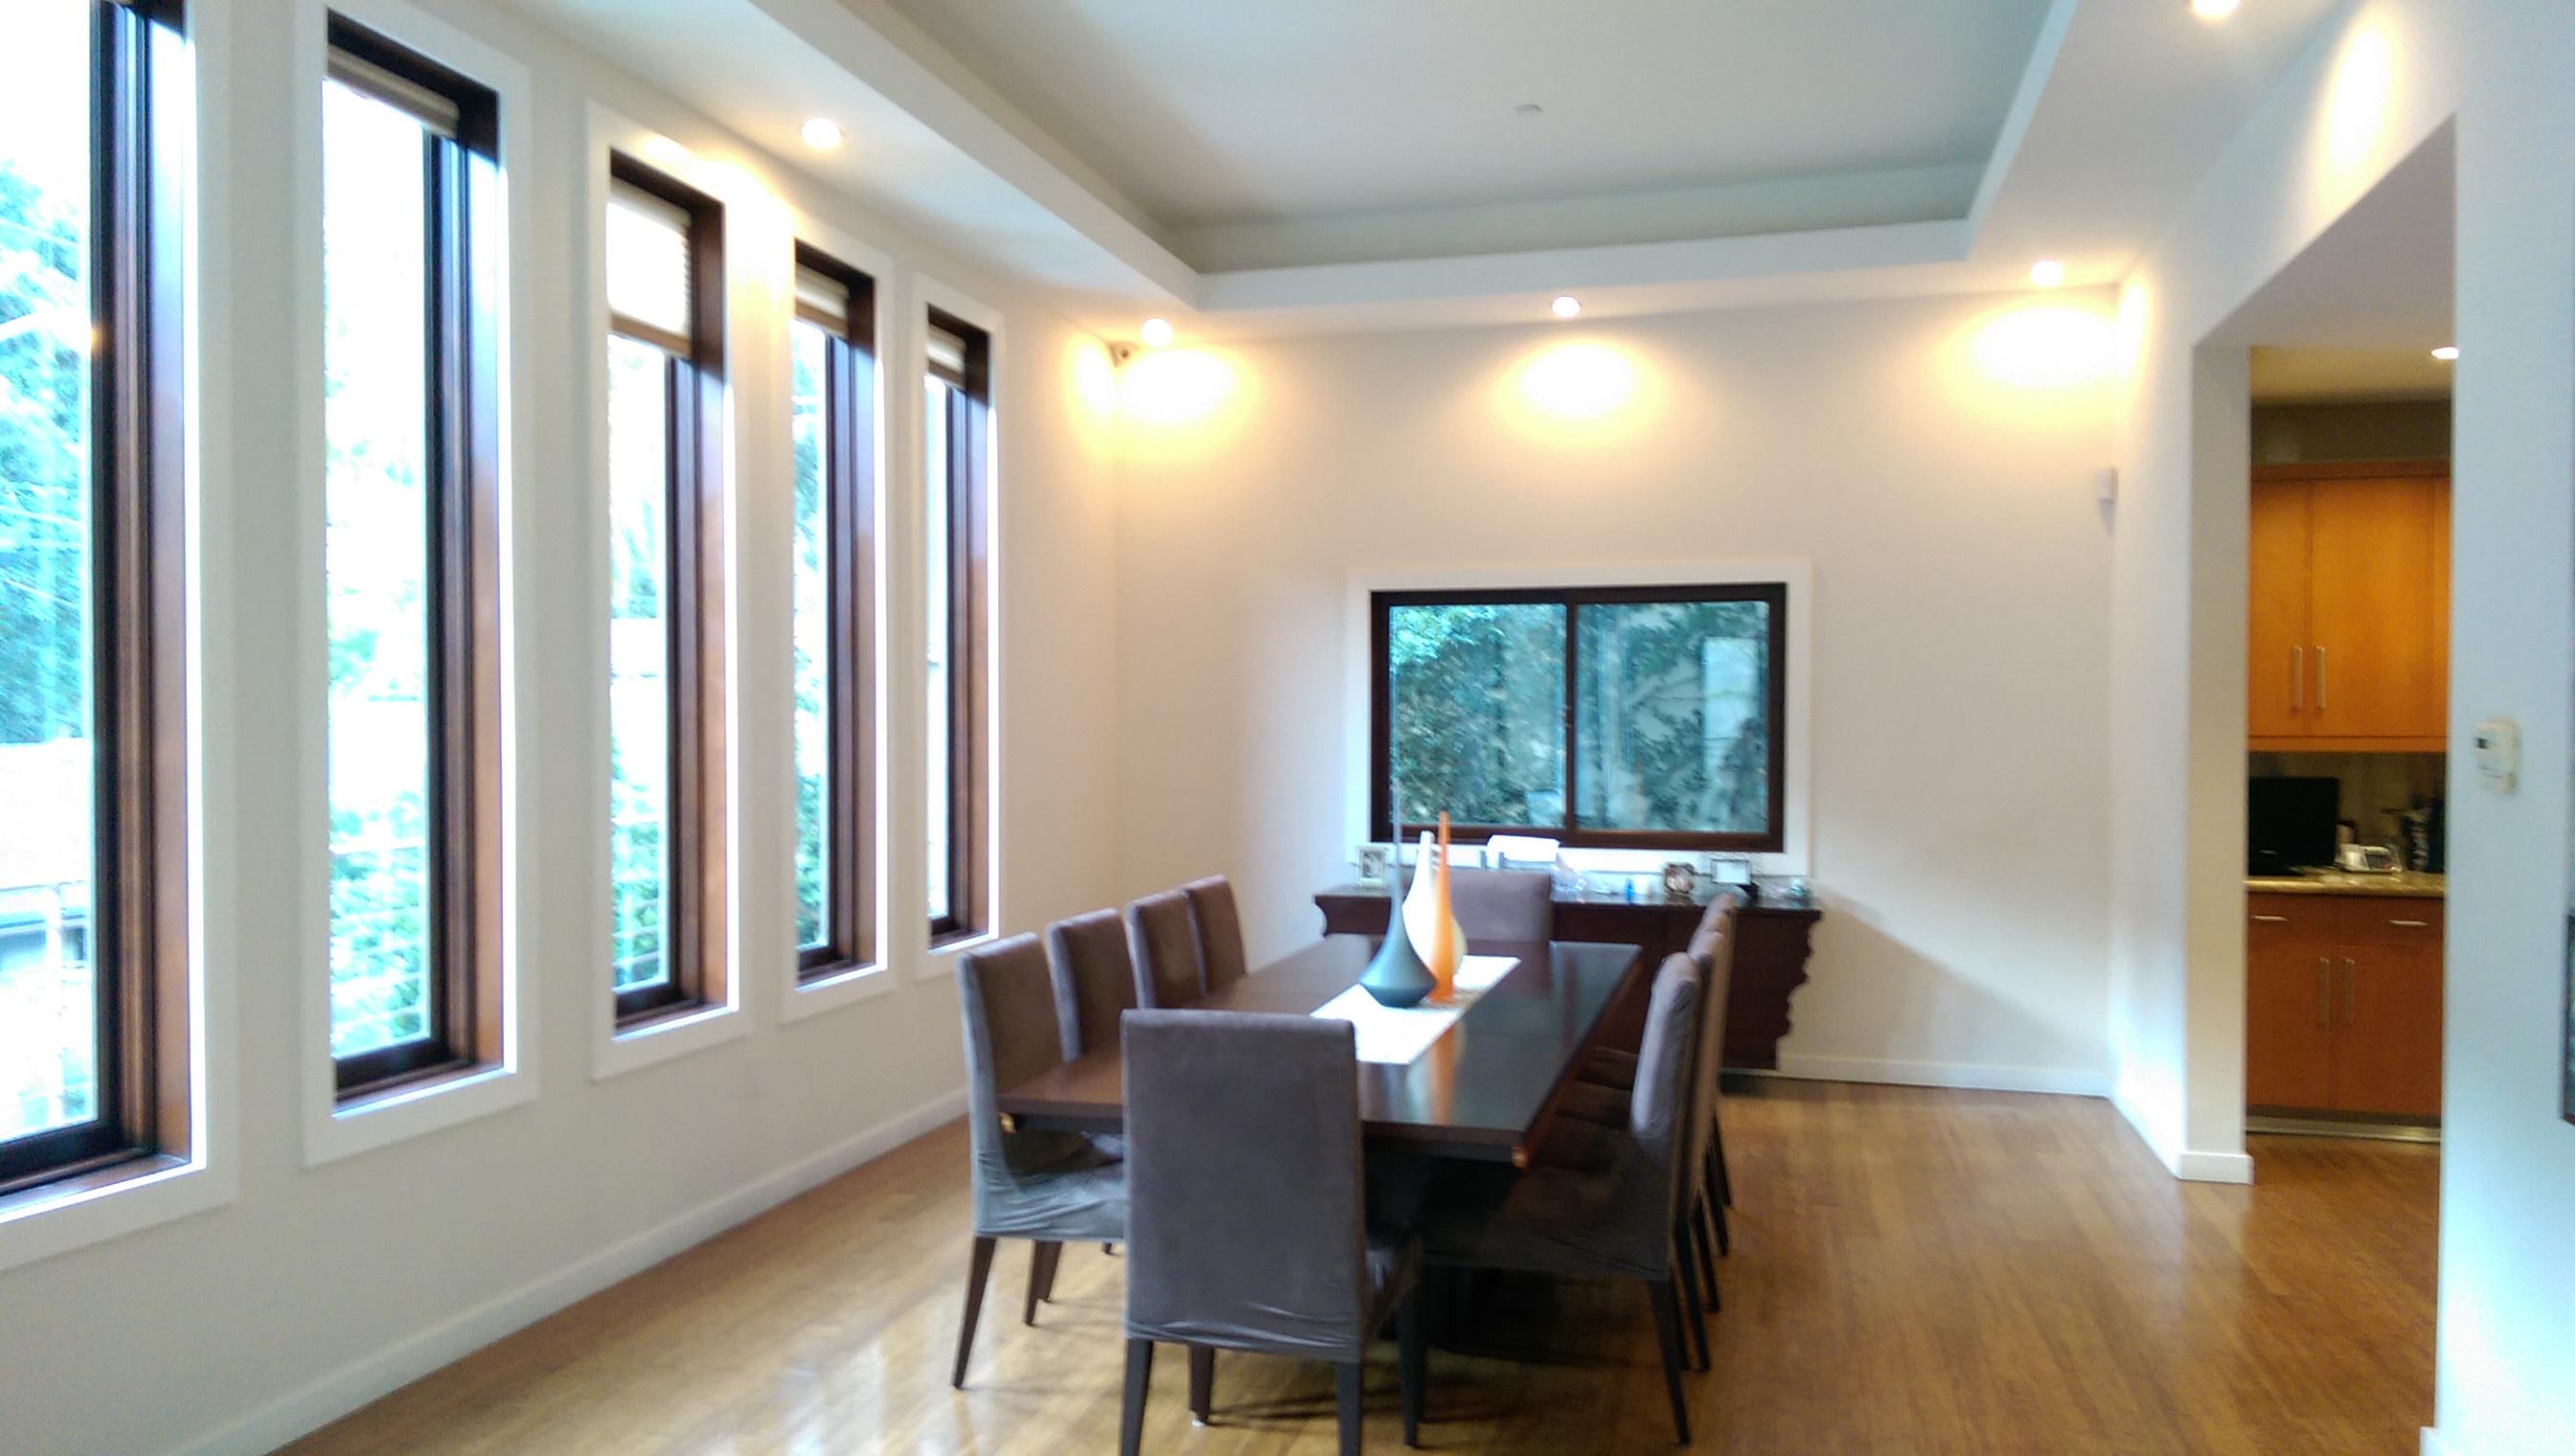 Dining Room, Table, Chair, Hardwood Floors, Bright, High Ceilings, Entertainment